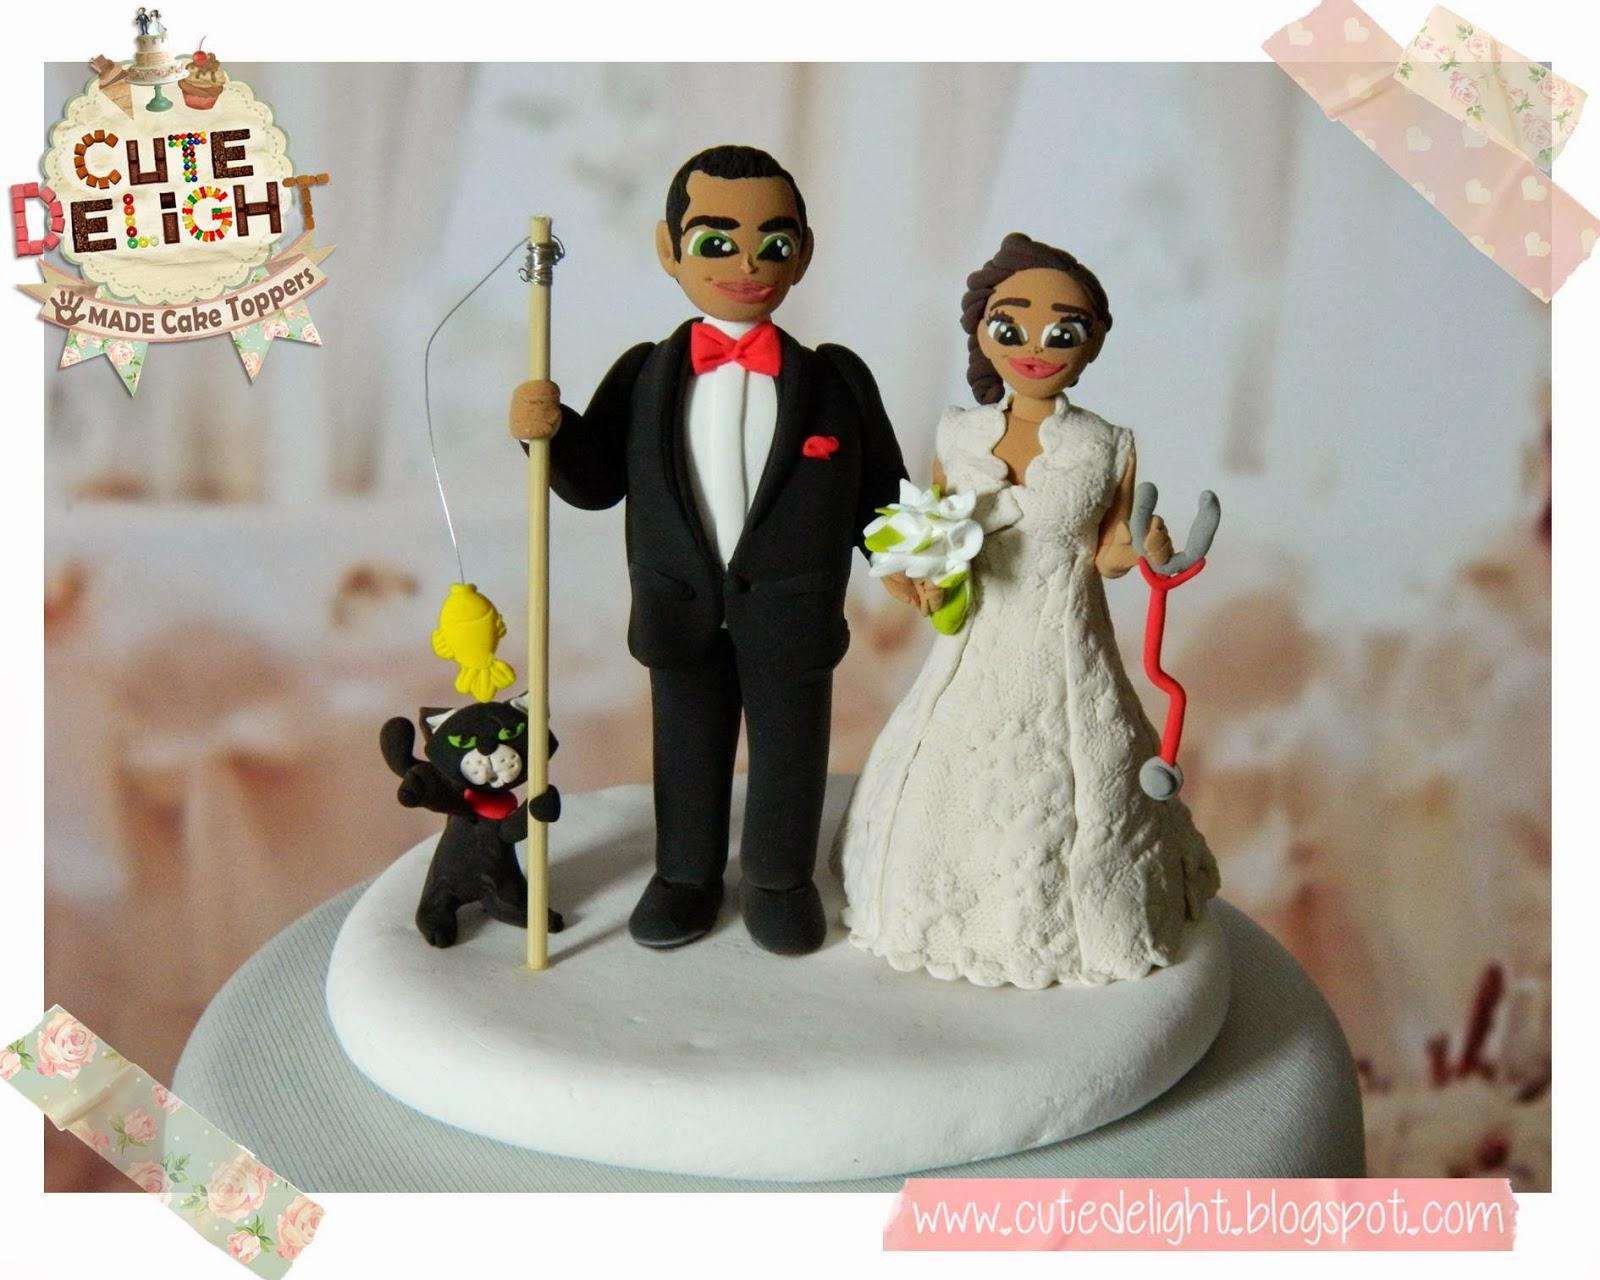 doctor bride groom wedding cake toppers wedding cake toppers funny Wedding Cake Topper Custom Made Doctor Bride And Fisherman Groom With Black Cat